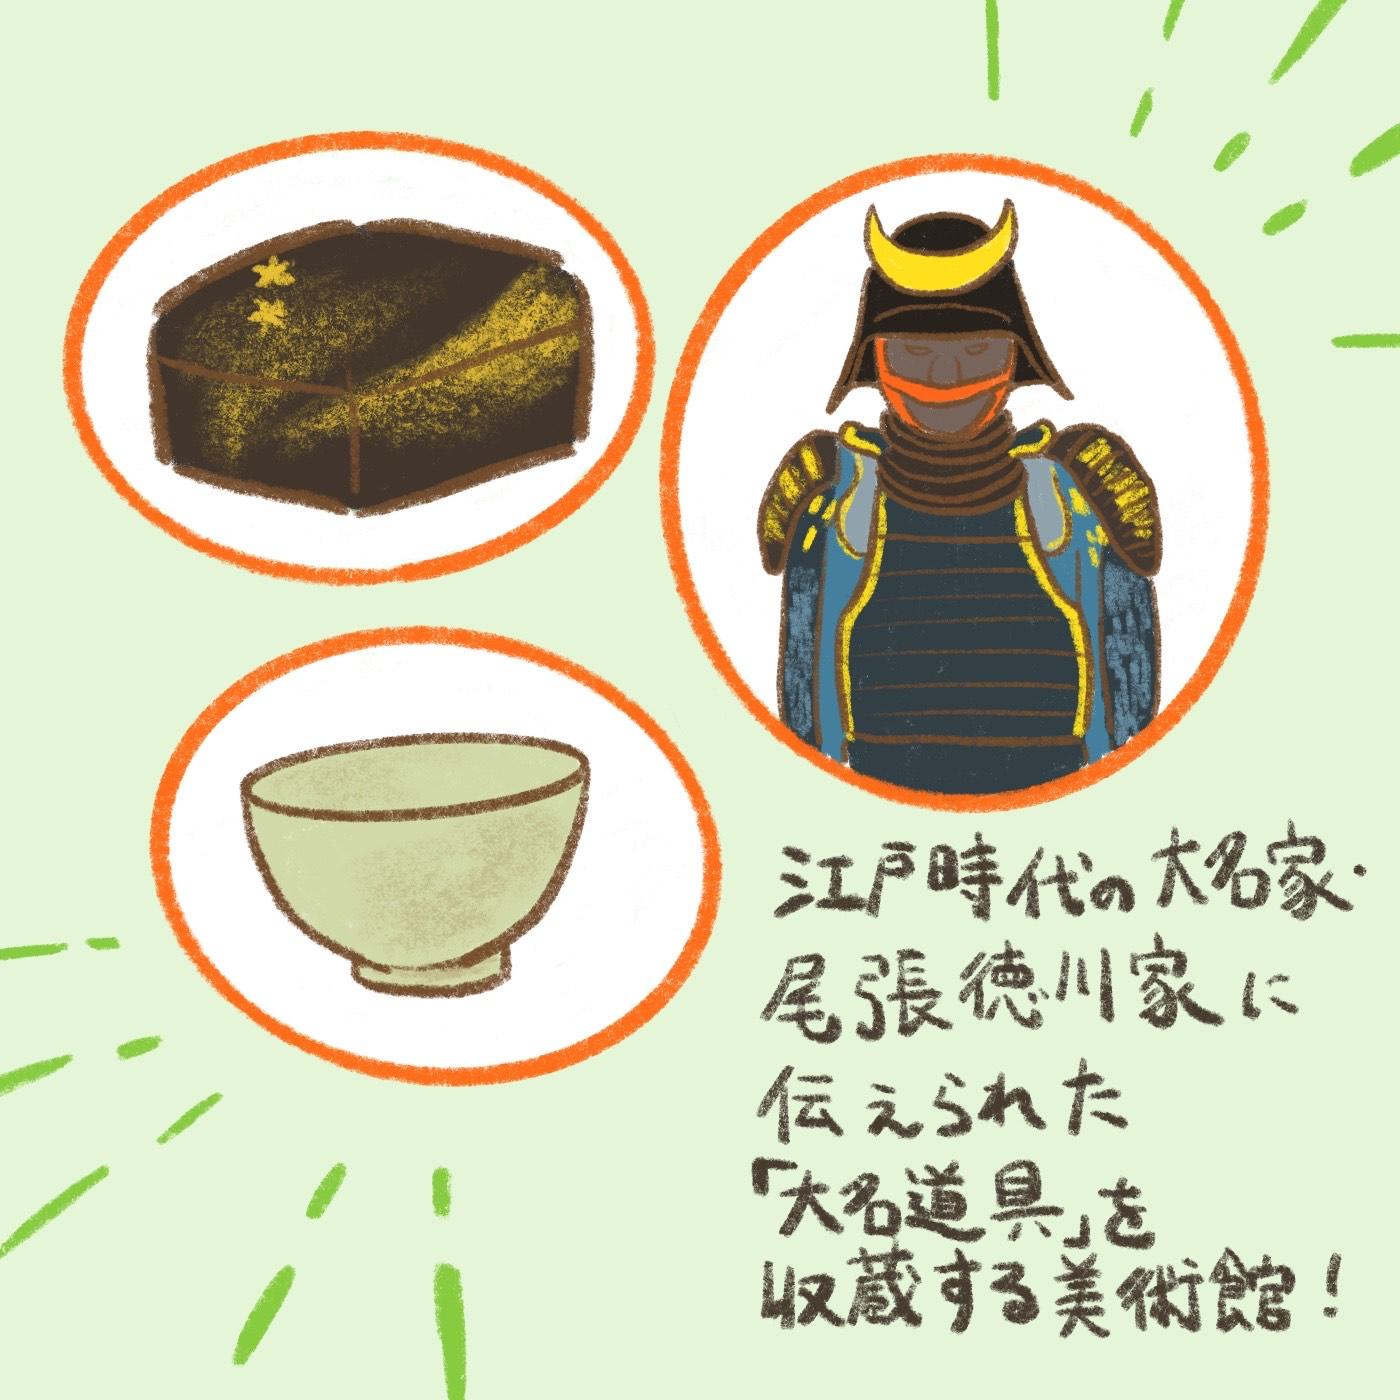 OBIKAKE ナニソレ 徳川美術館 大名道具 愛知県